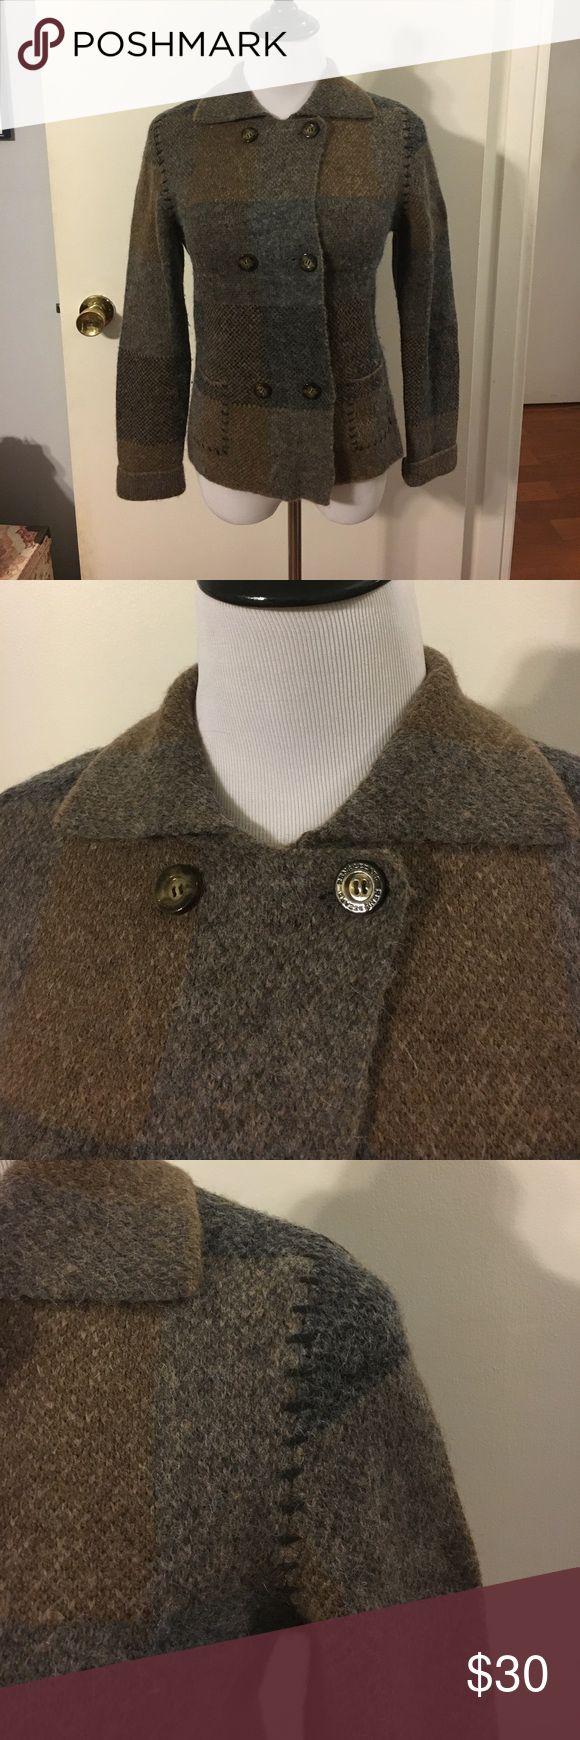 René Lezard gorgeous double breasted sweater coat Front patch pockets. Wool/alpaca/polyamide blend. Cuffs. Super soft! French size 36 René Lezard Jackets & Coats